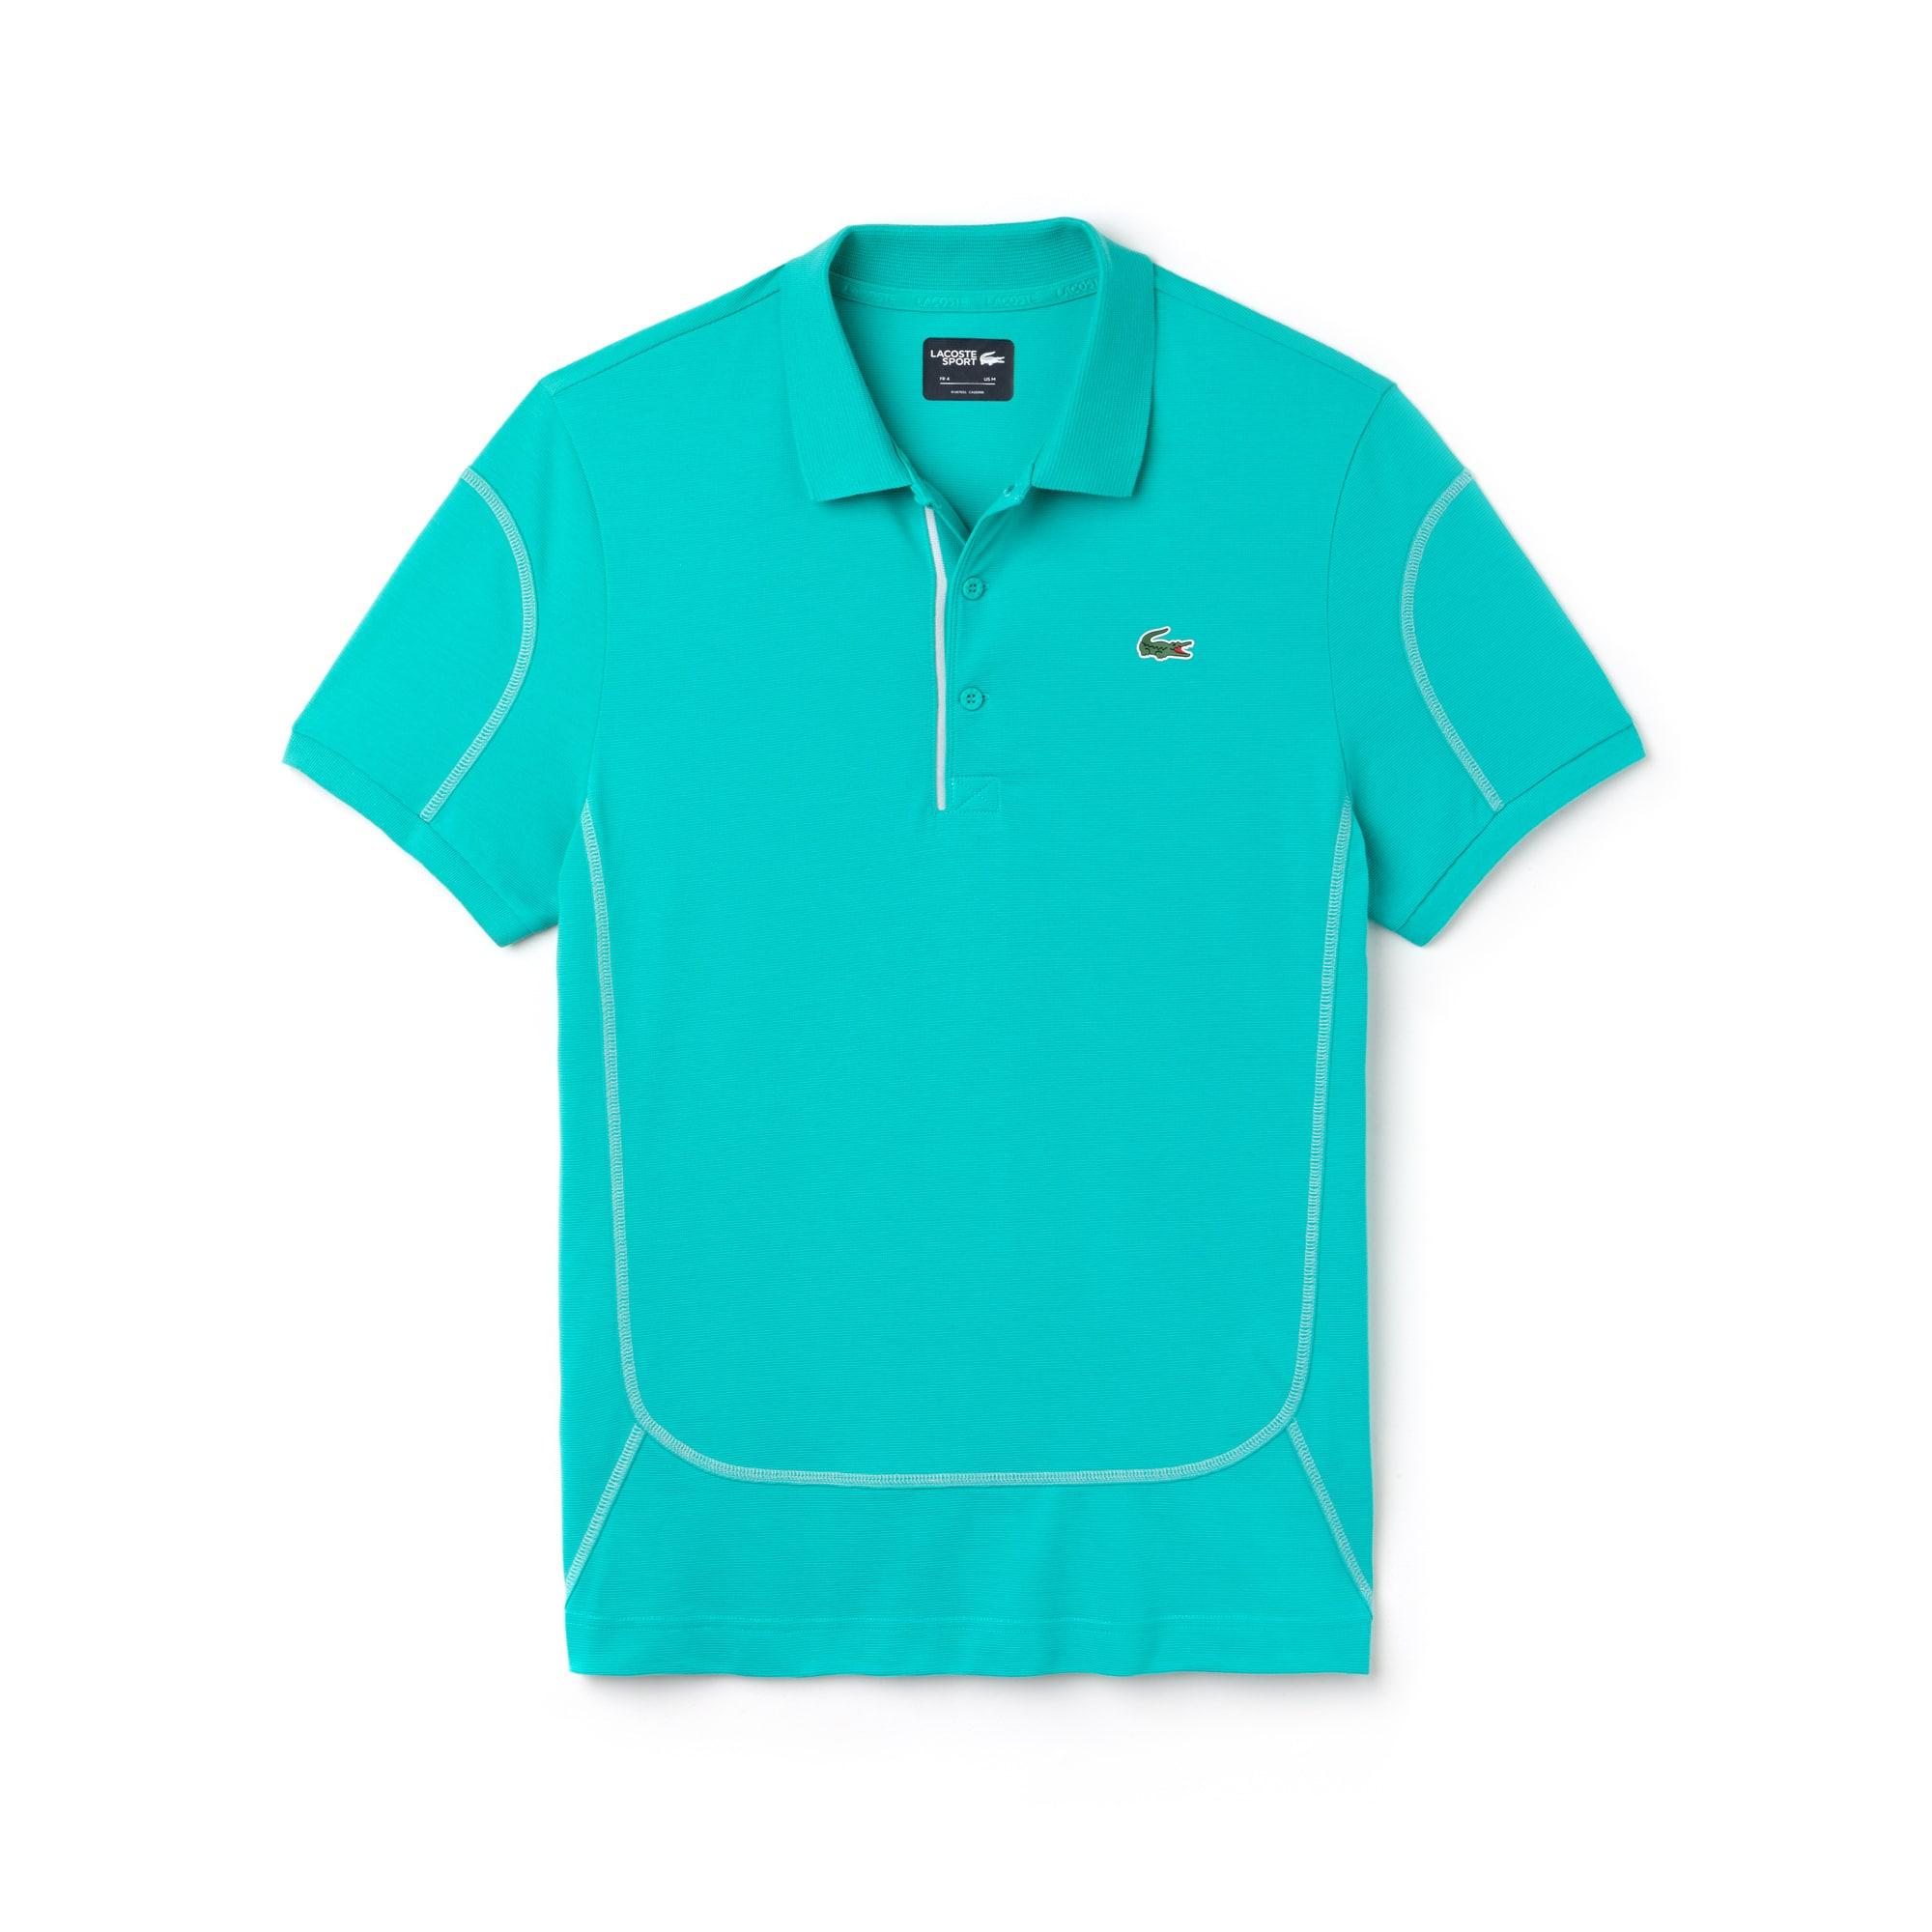 Men's Lacoste SPORT Contrast Stitching Light Cotton Tennis Polo